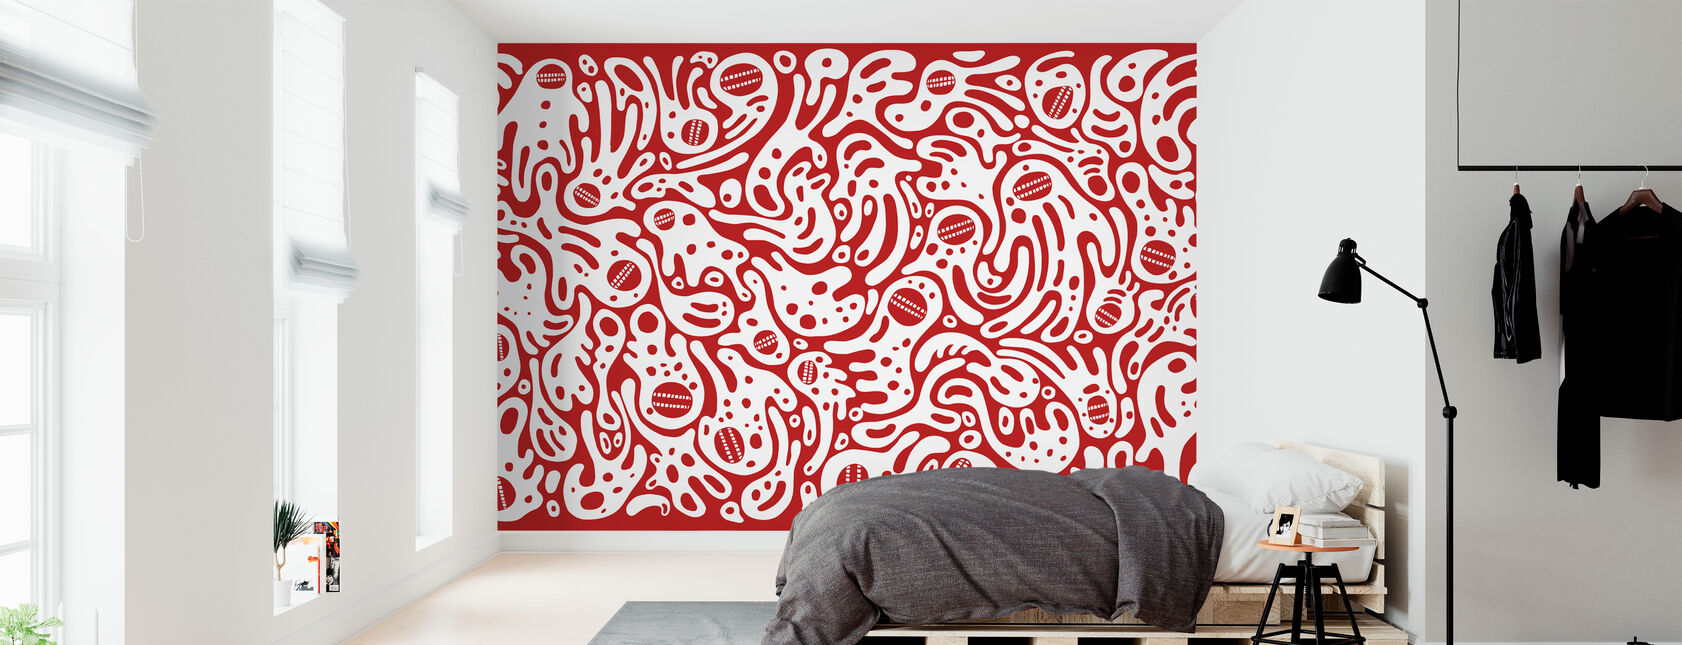 DT Wall1 - Tapete - Schlafzimmer